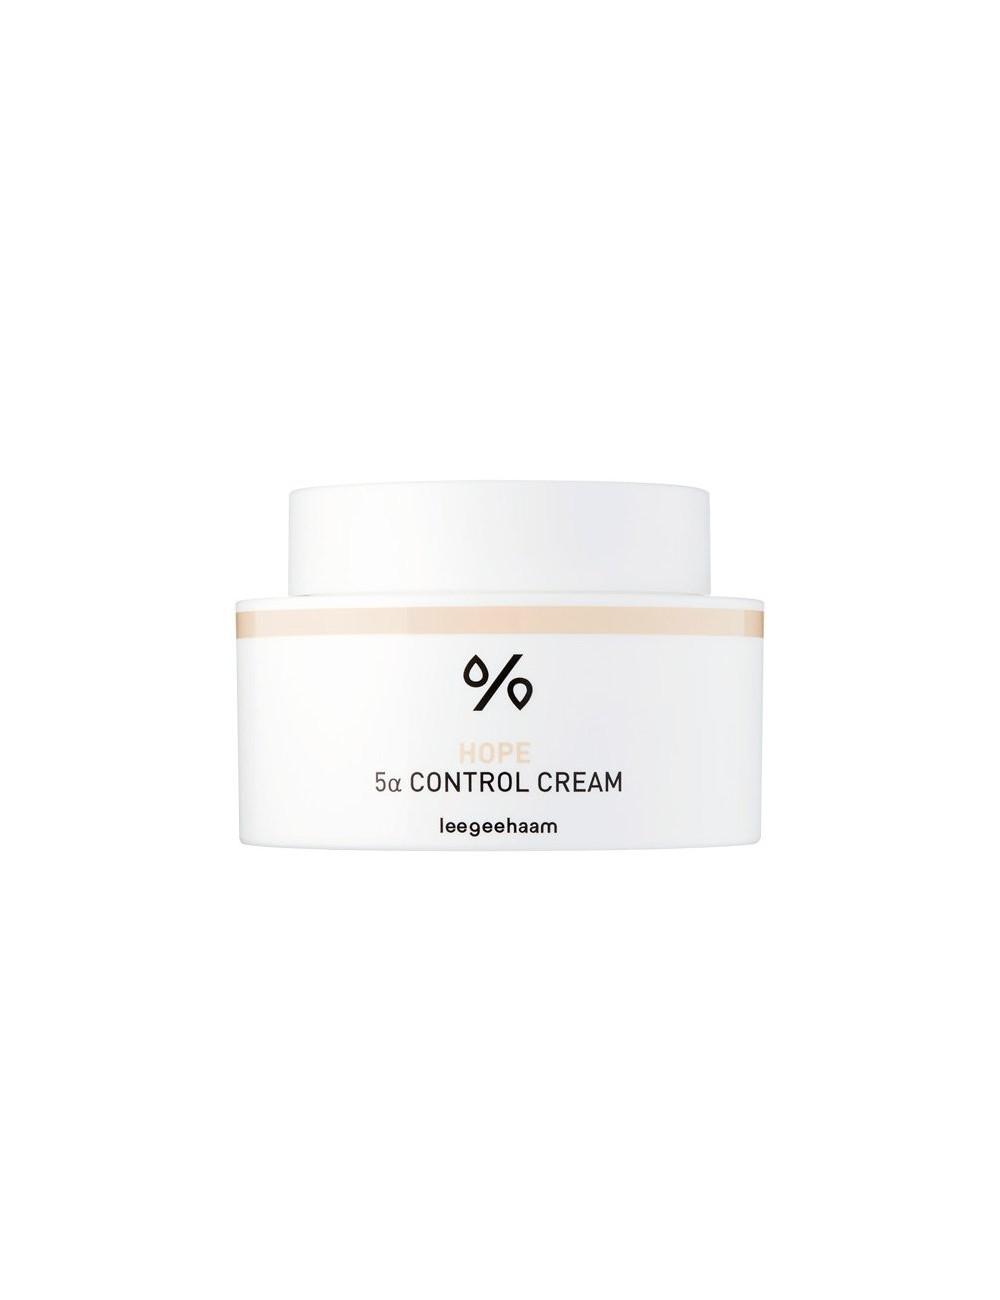 Crema hidratante Leegeehaam Hope 5 Alpha Control Cream